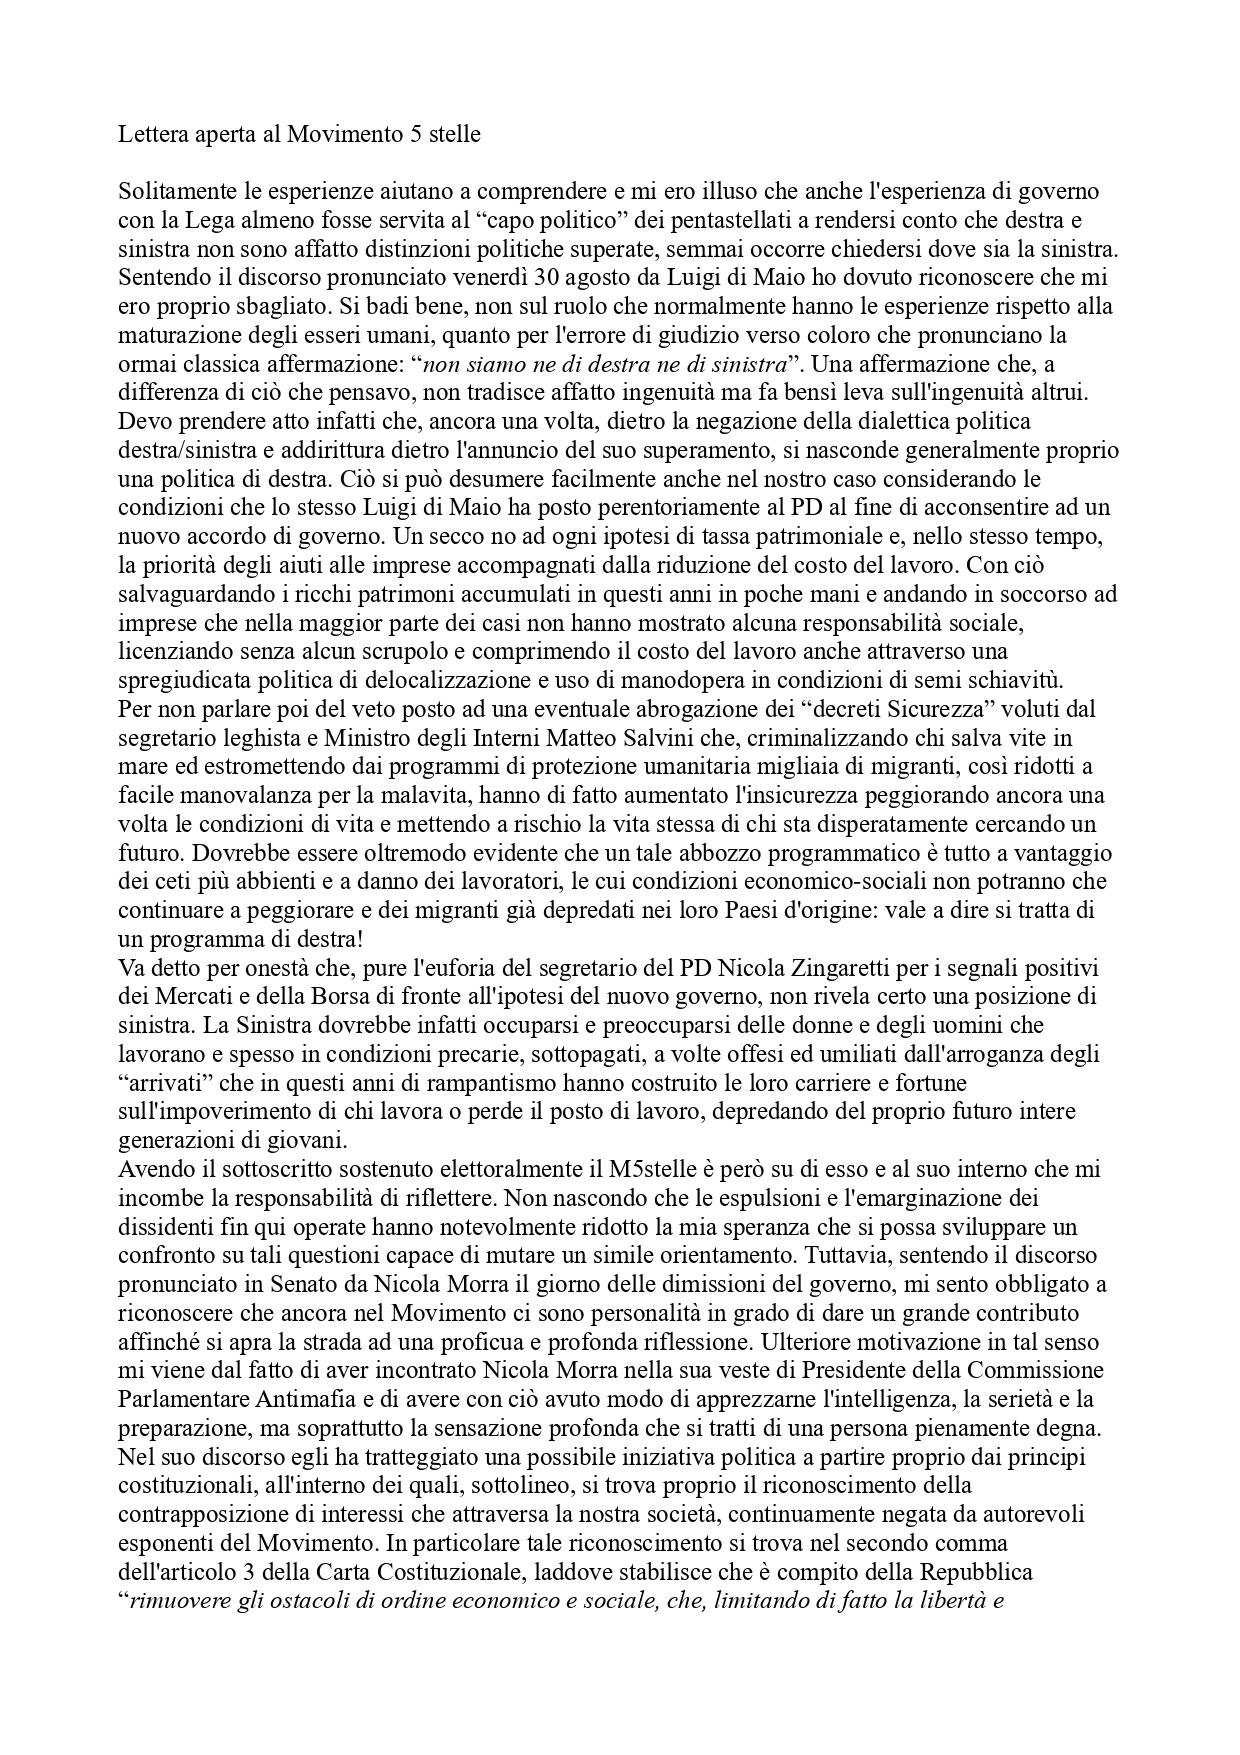 20190901_Lettera aperta al M5 Stelle_page-0001